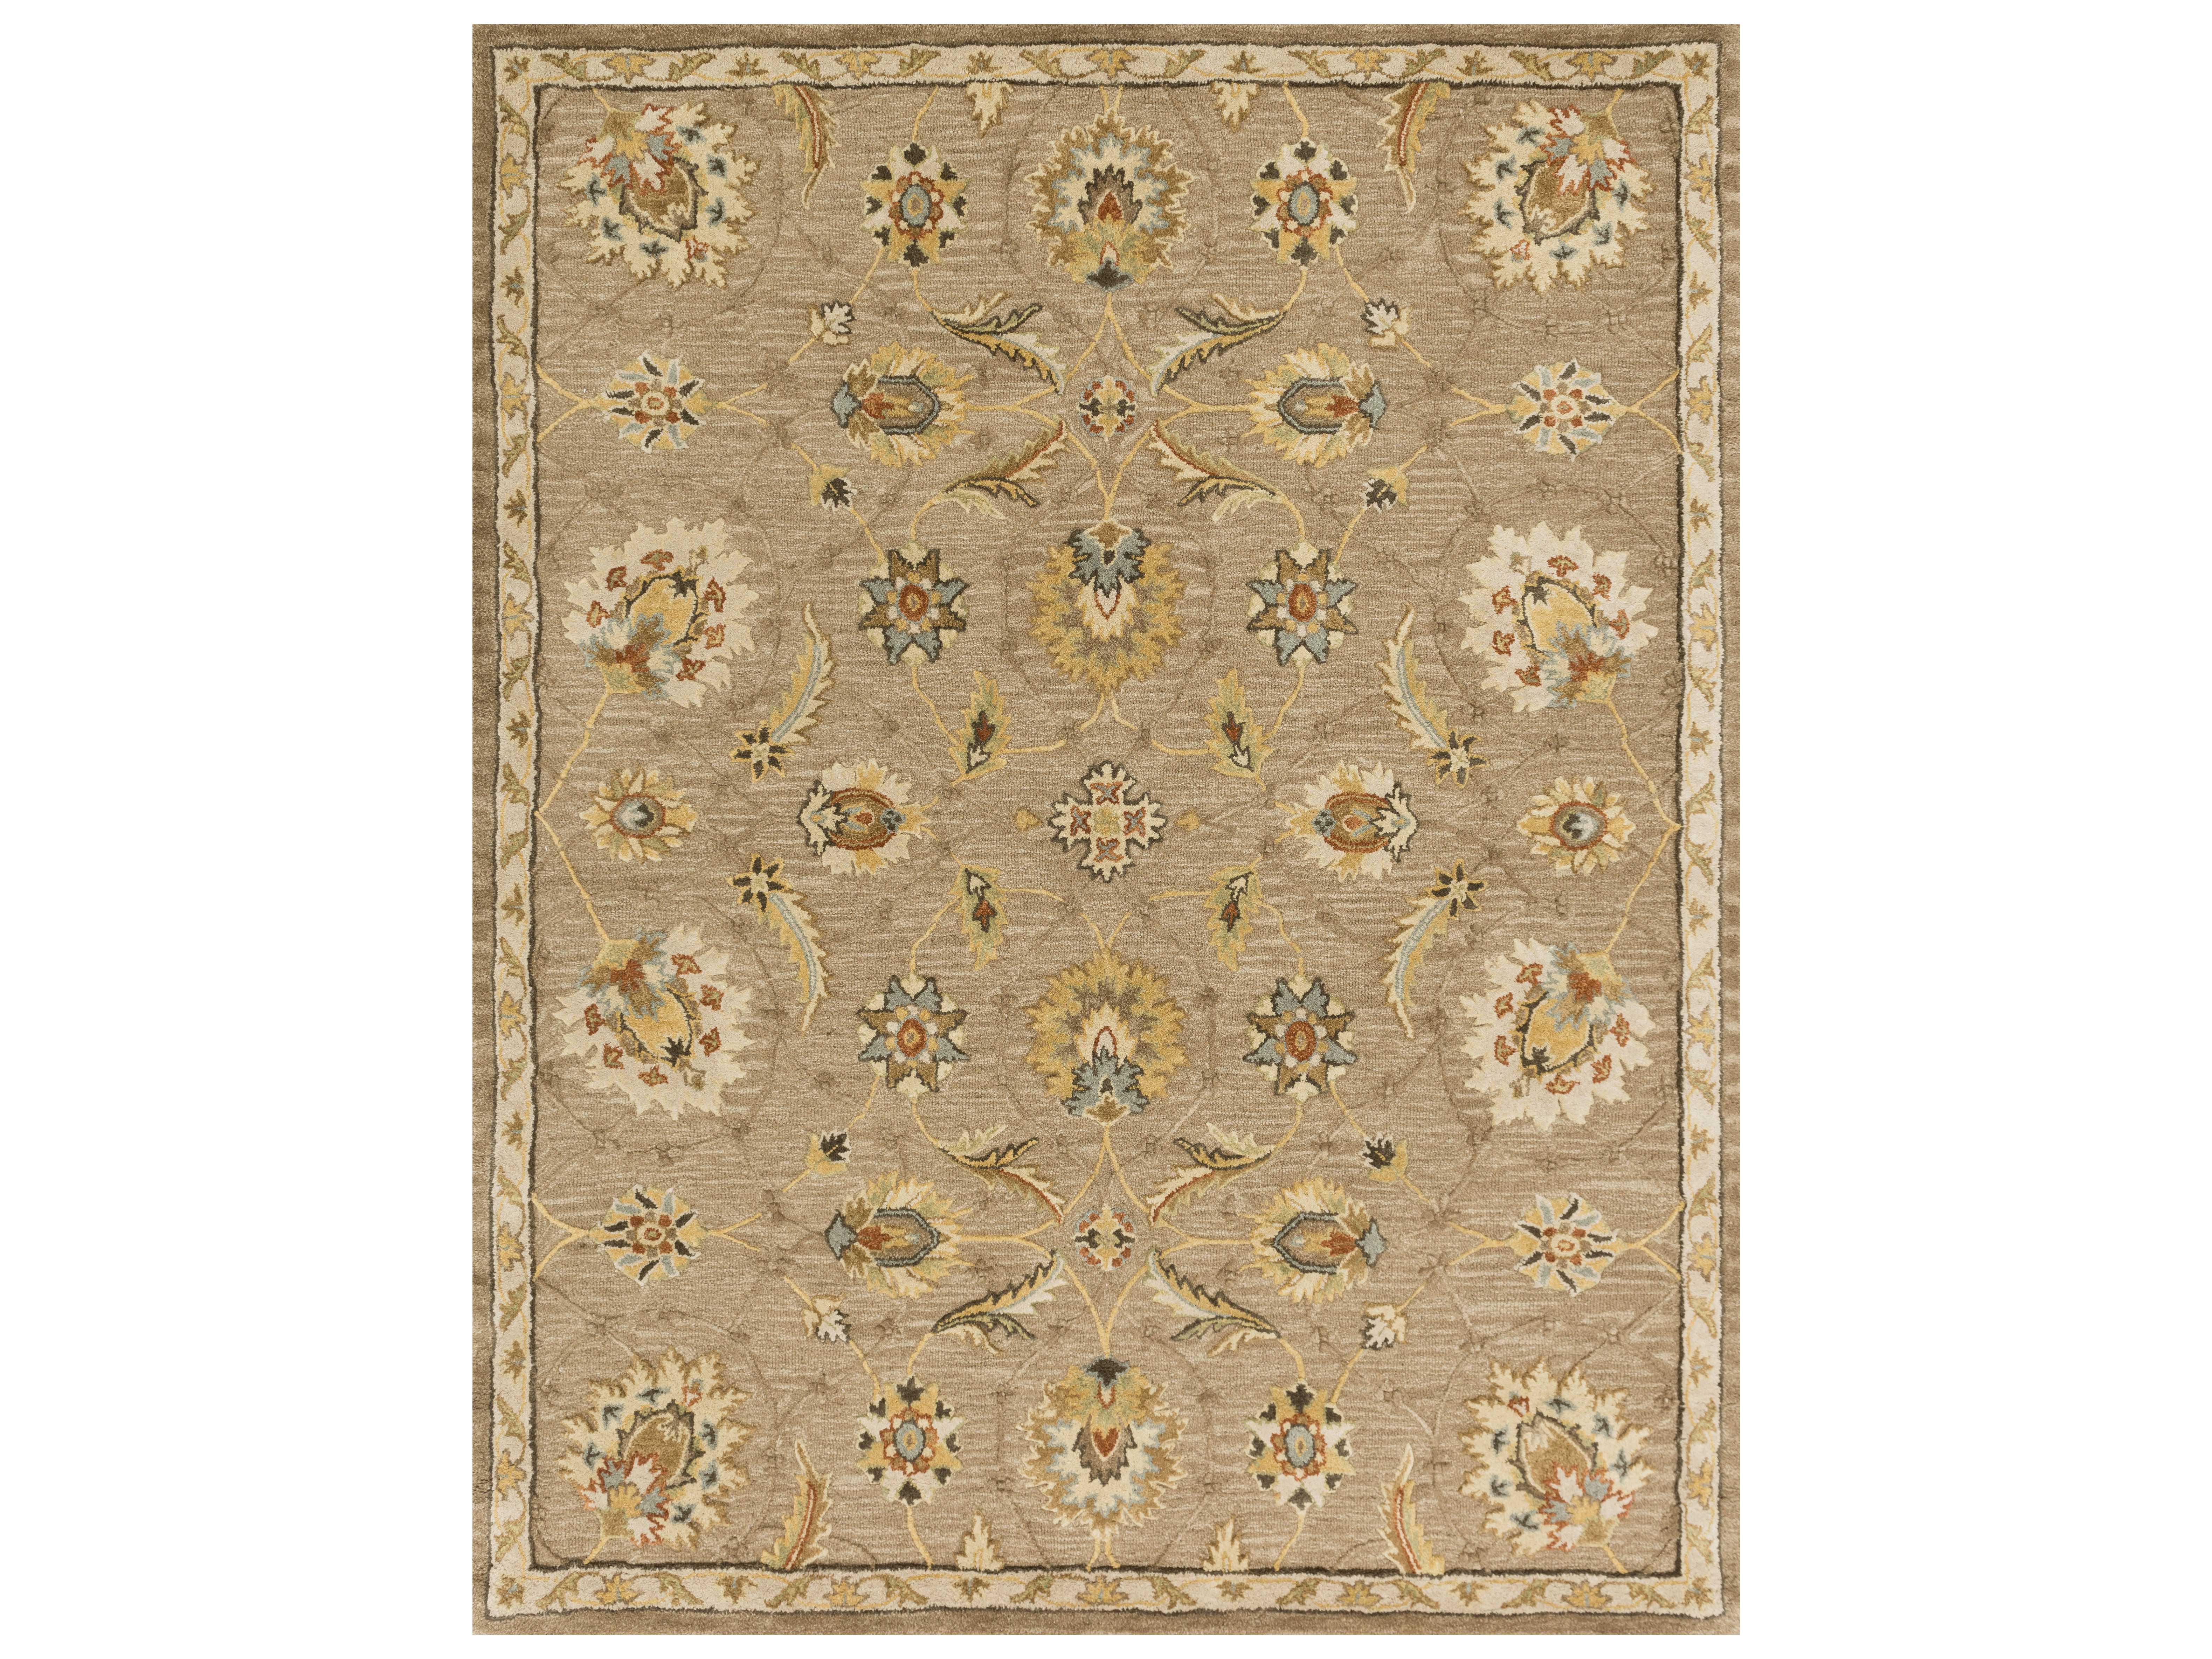 Beige Mocha Väska : Loloi rugs walden wd mocha beige area rug